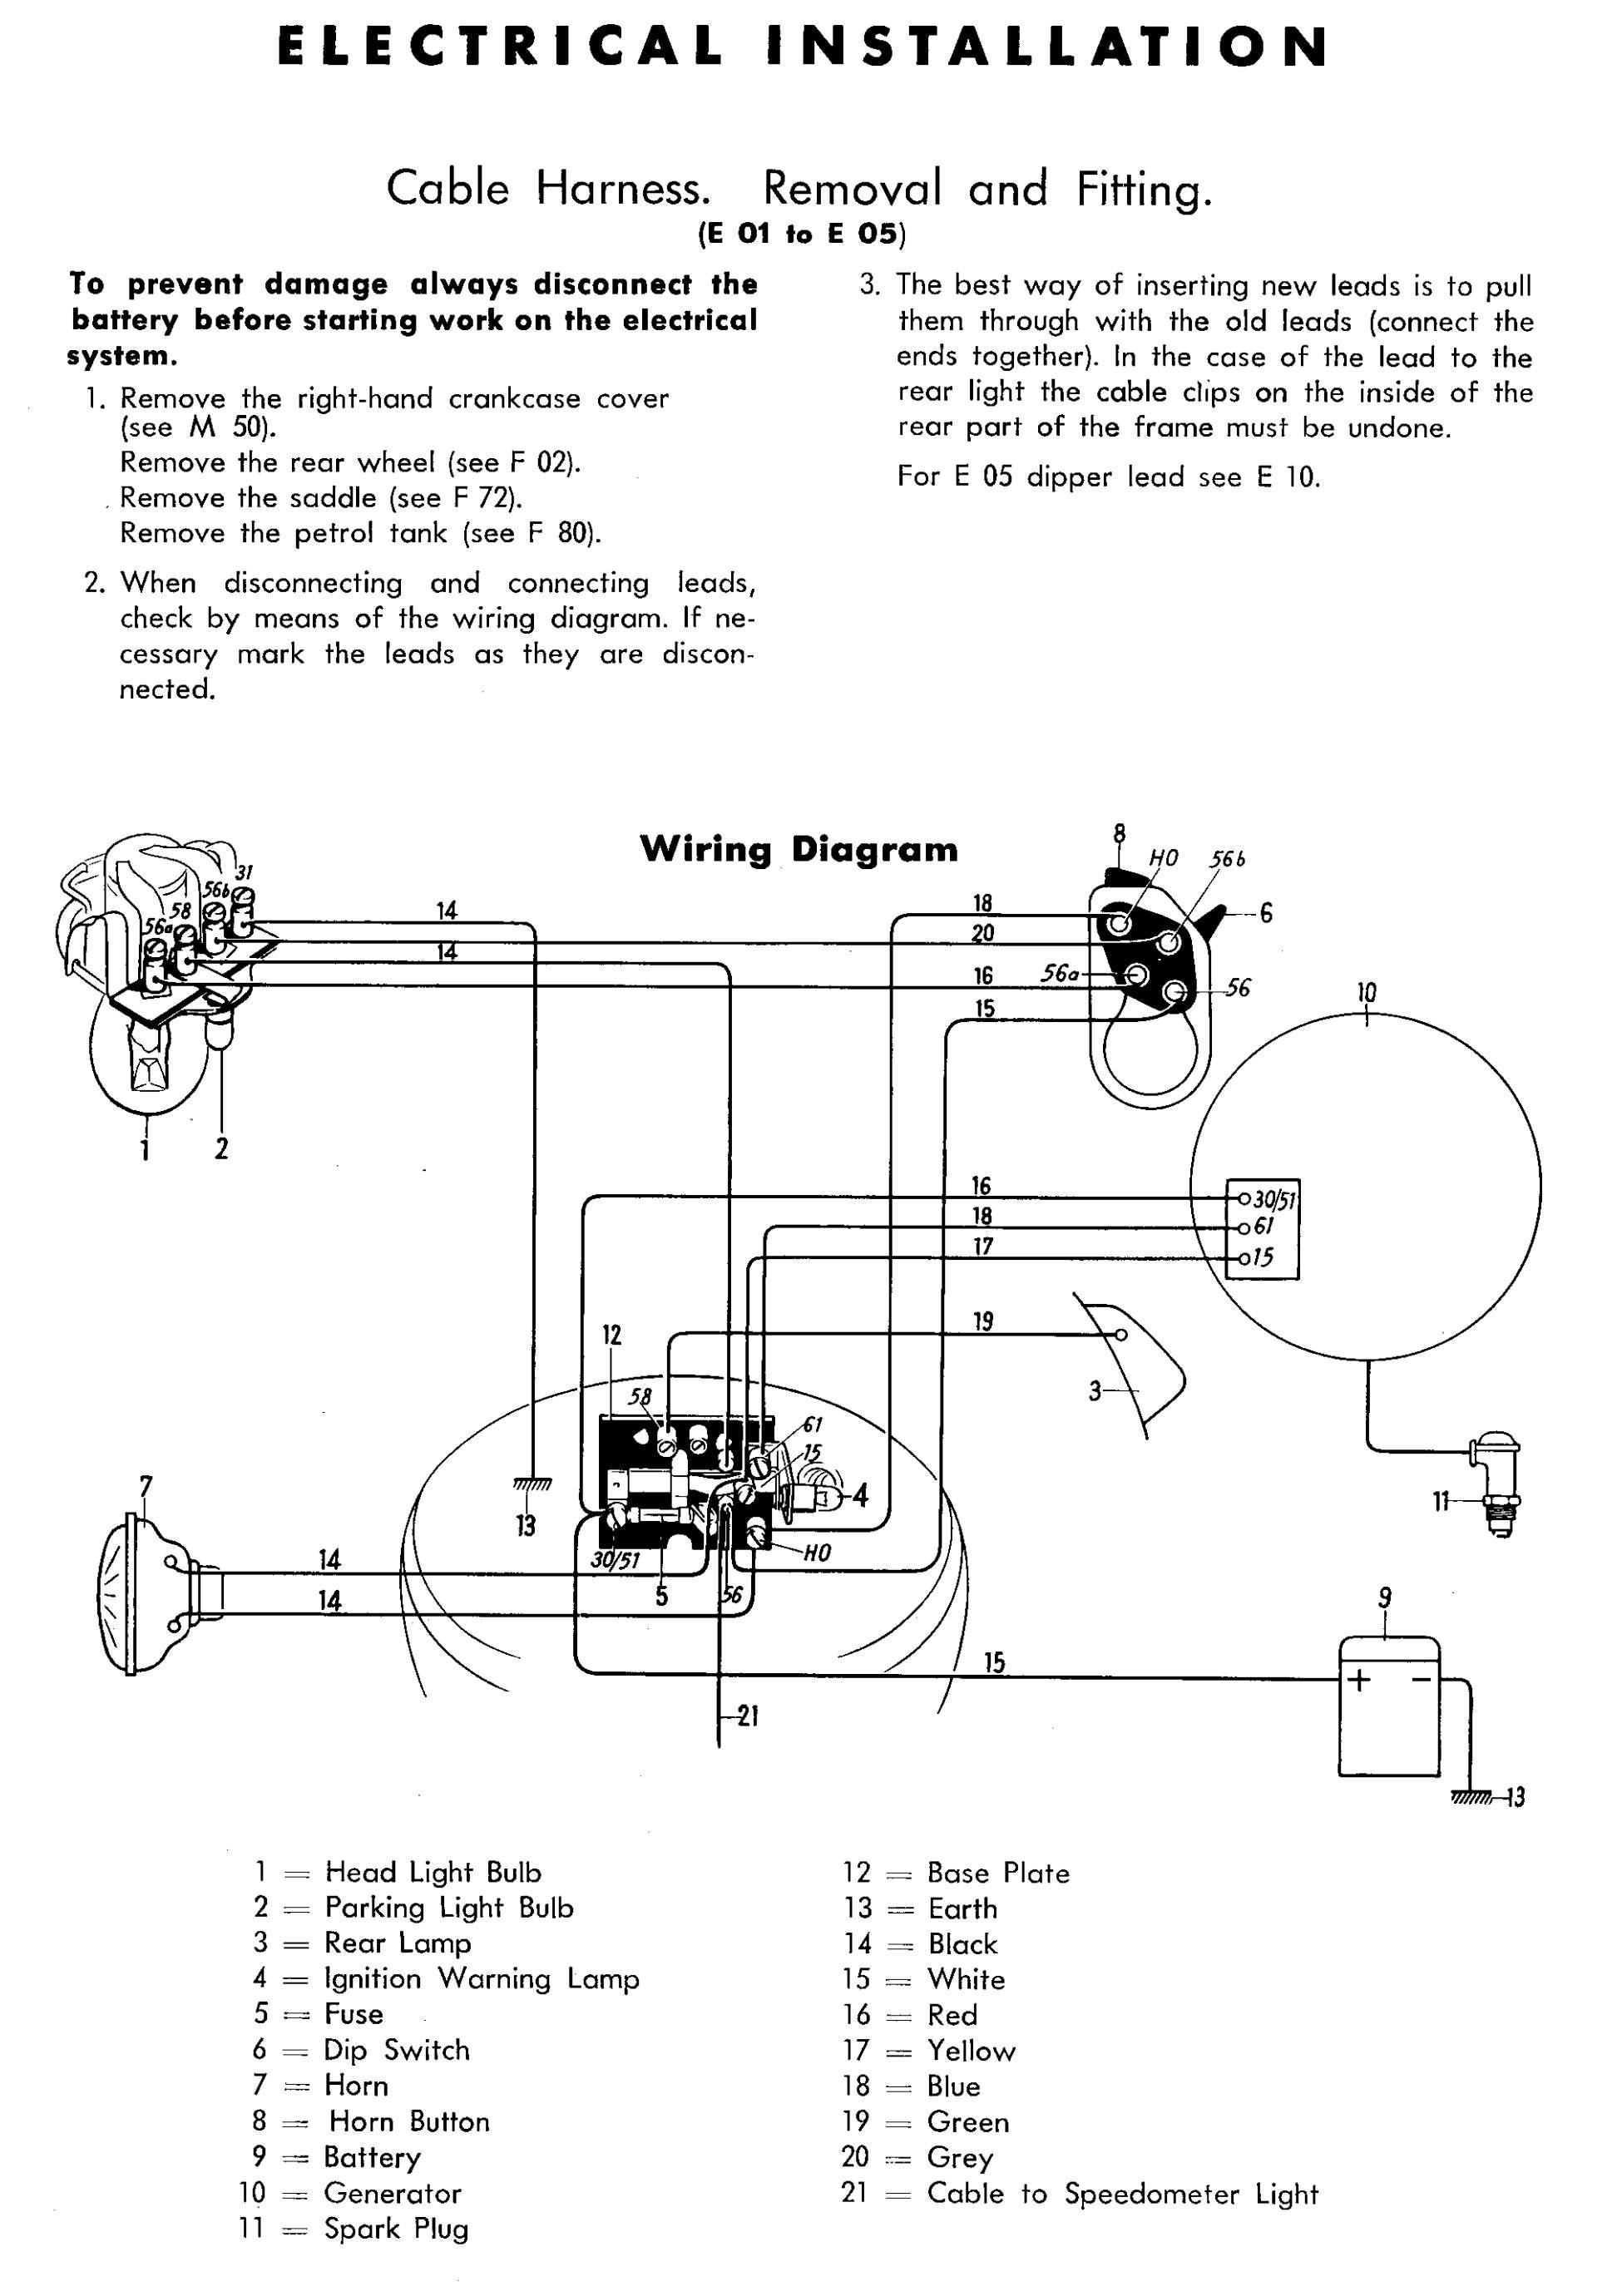 1994 harley davidson wiring diagram parallel for lights dan's motorcycle